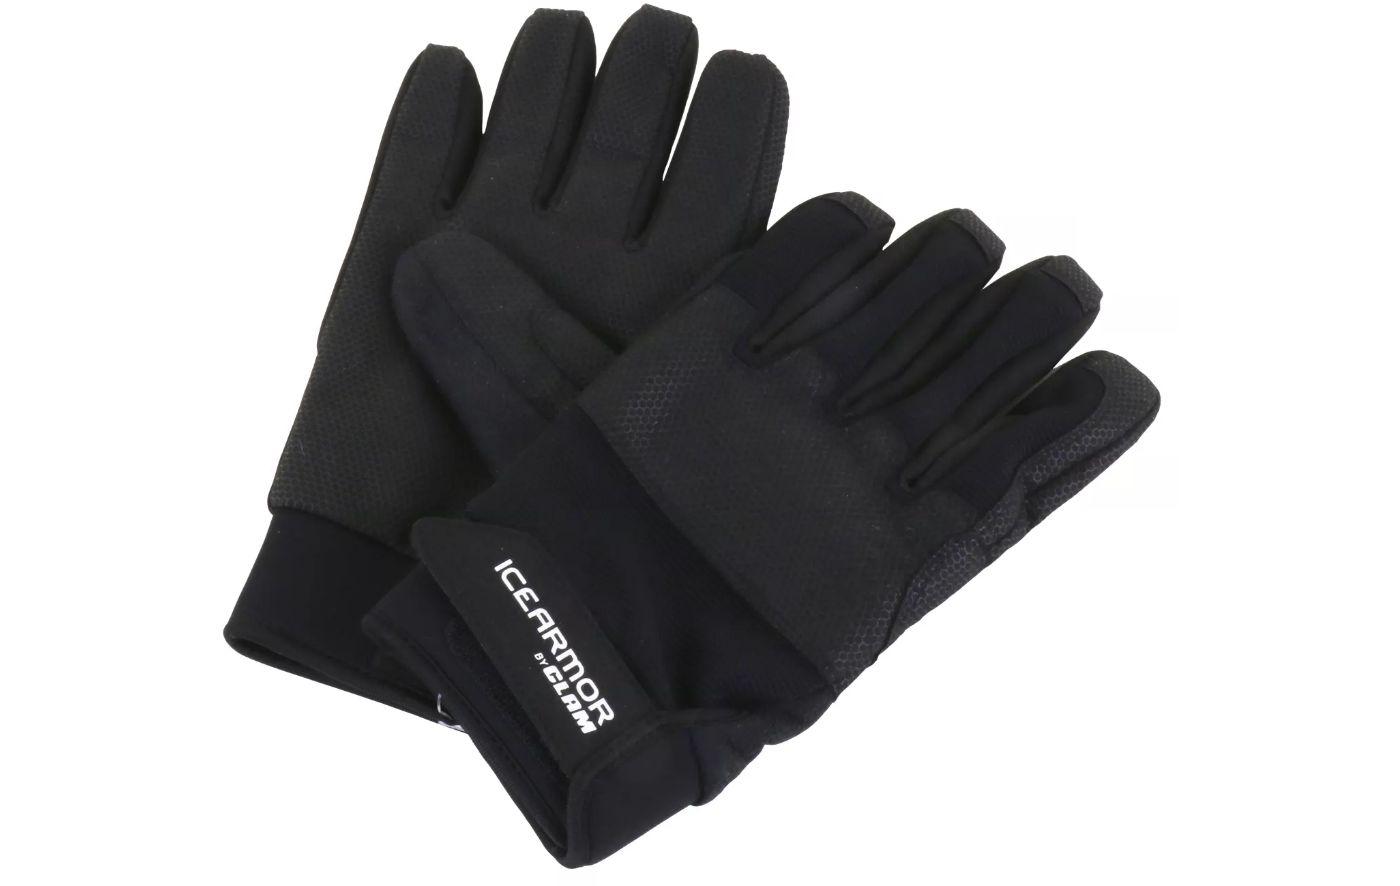 Clam IceArmor Waterproof Tactical Gloves